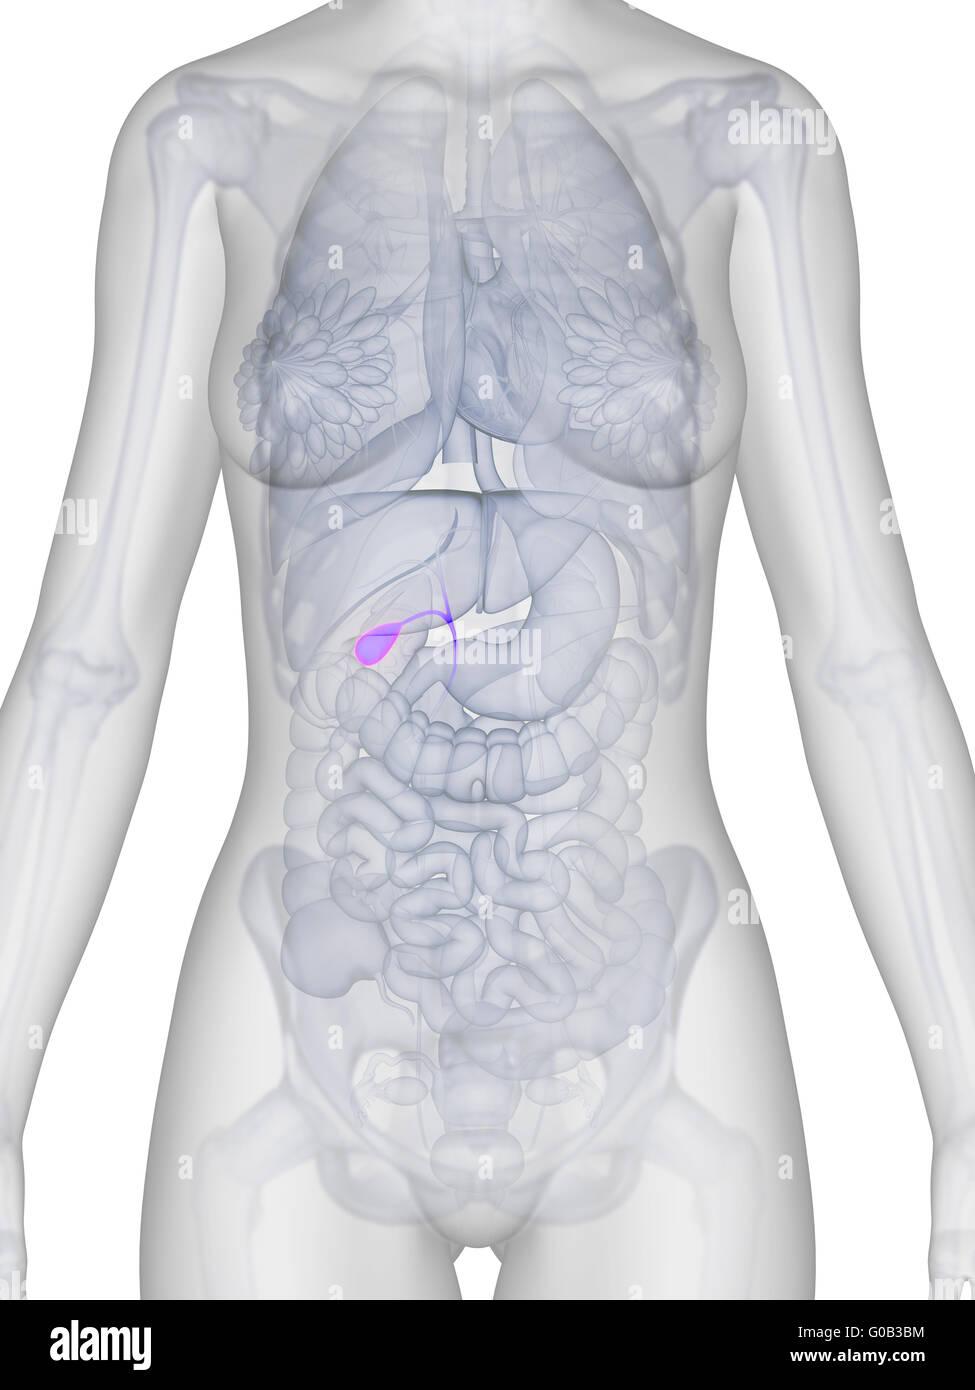 Health Science Anatomy Body Physiology Human Female Organs Stock